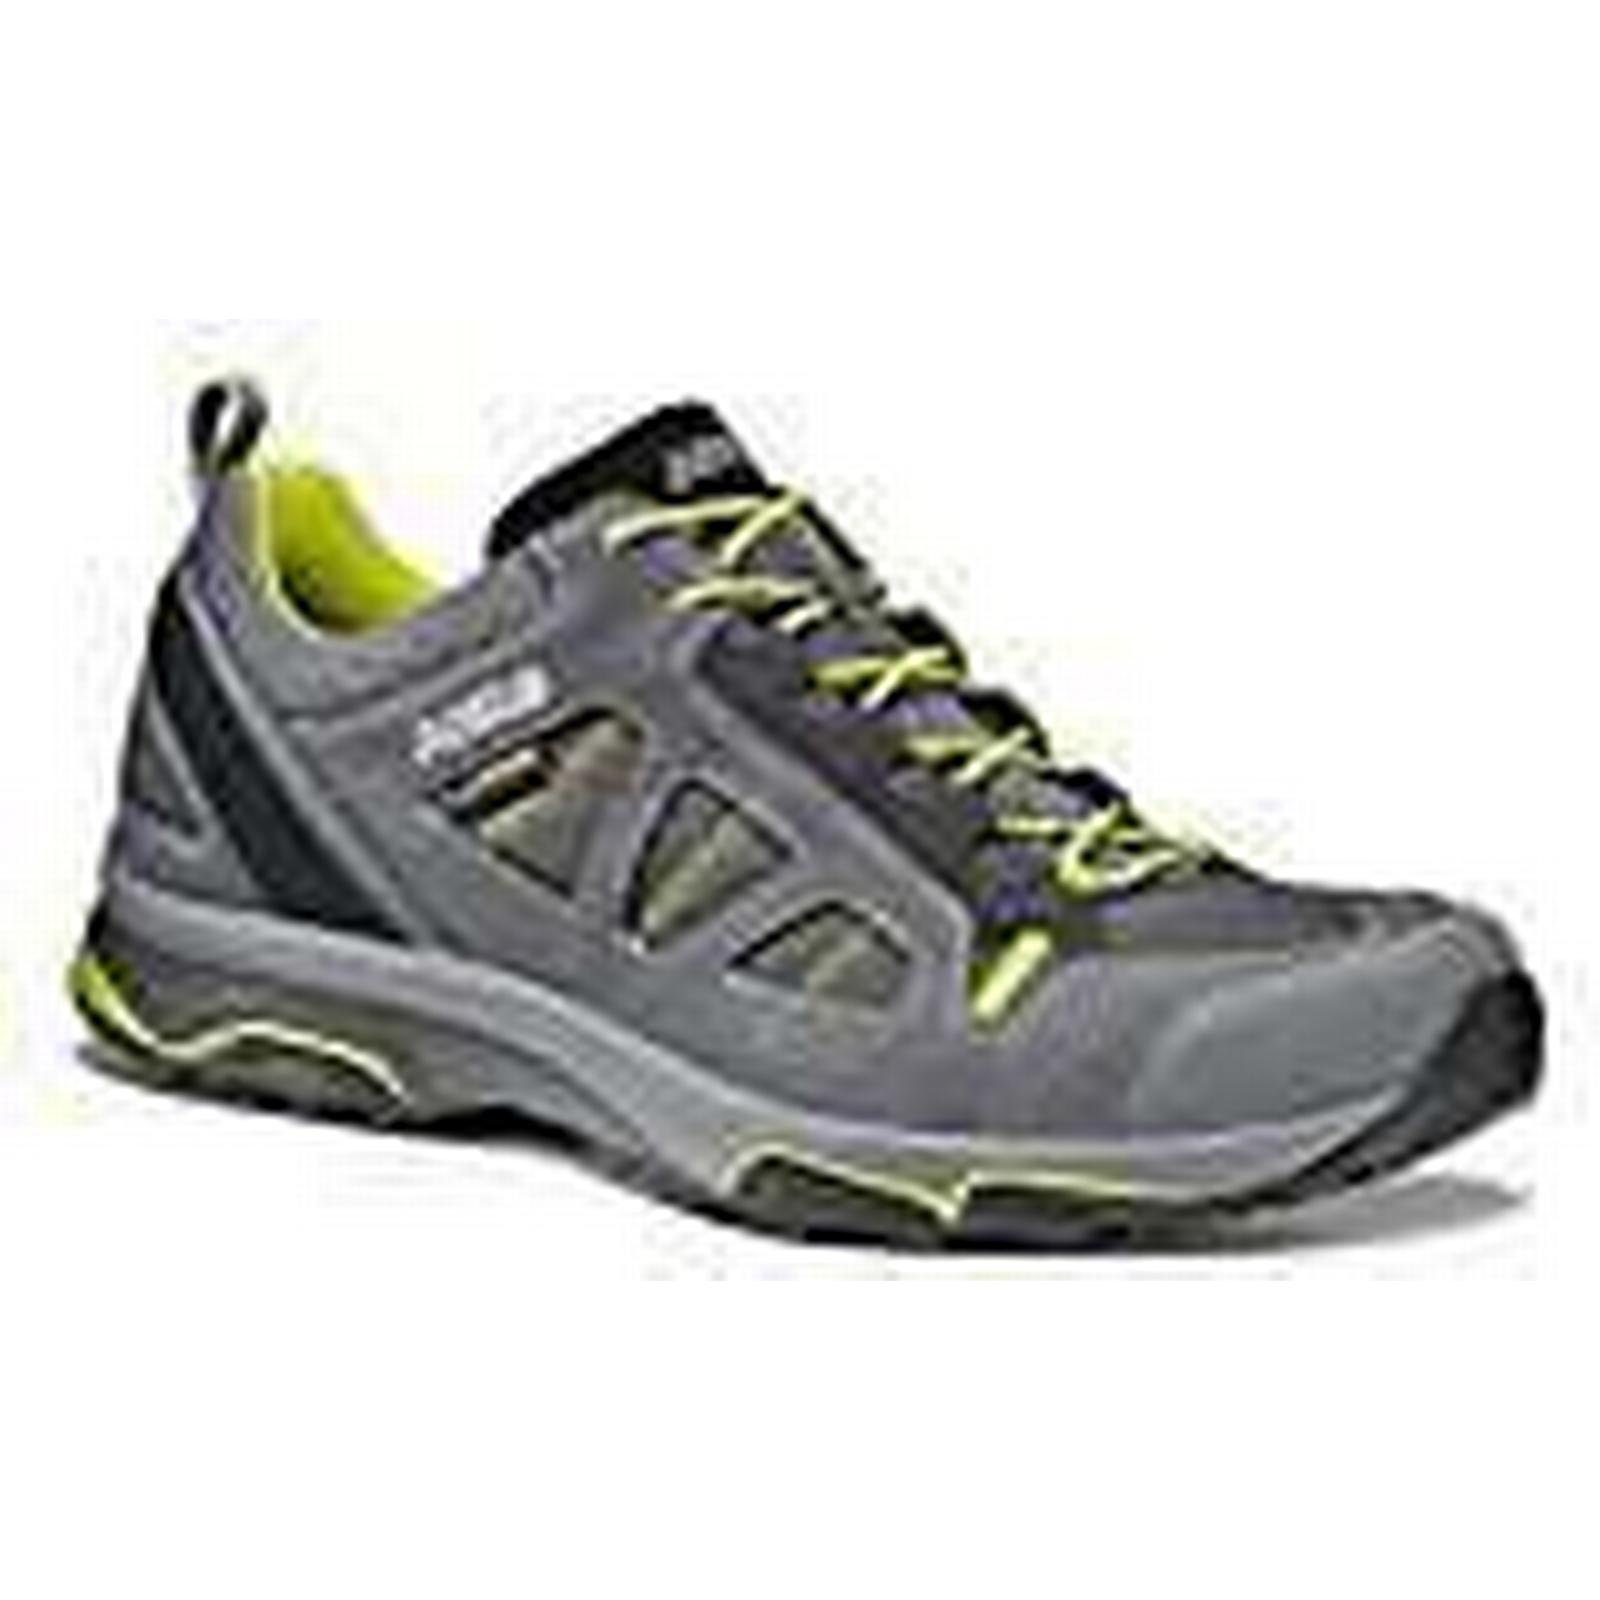 Asolo Men's Megaton Gv Mm Low (Grigio/Grafite Rise Hiking Shoes, Grey (Grigio/Grafite Low A610), 8.5 UK 0518ba